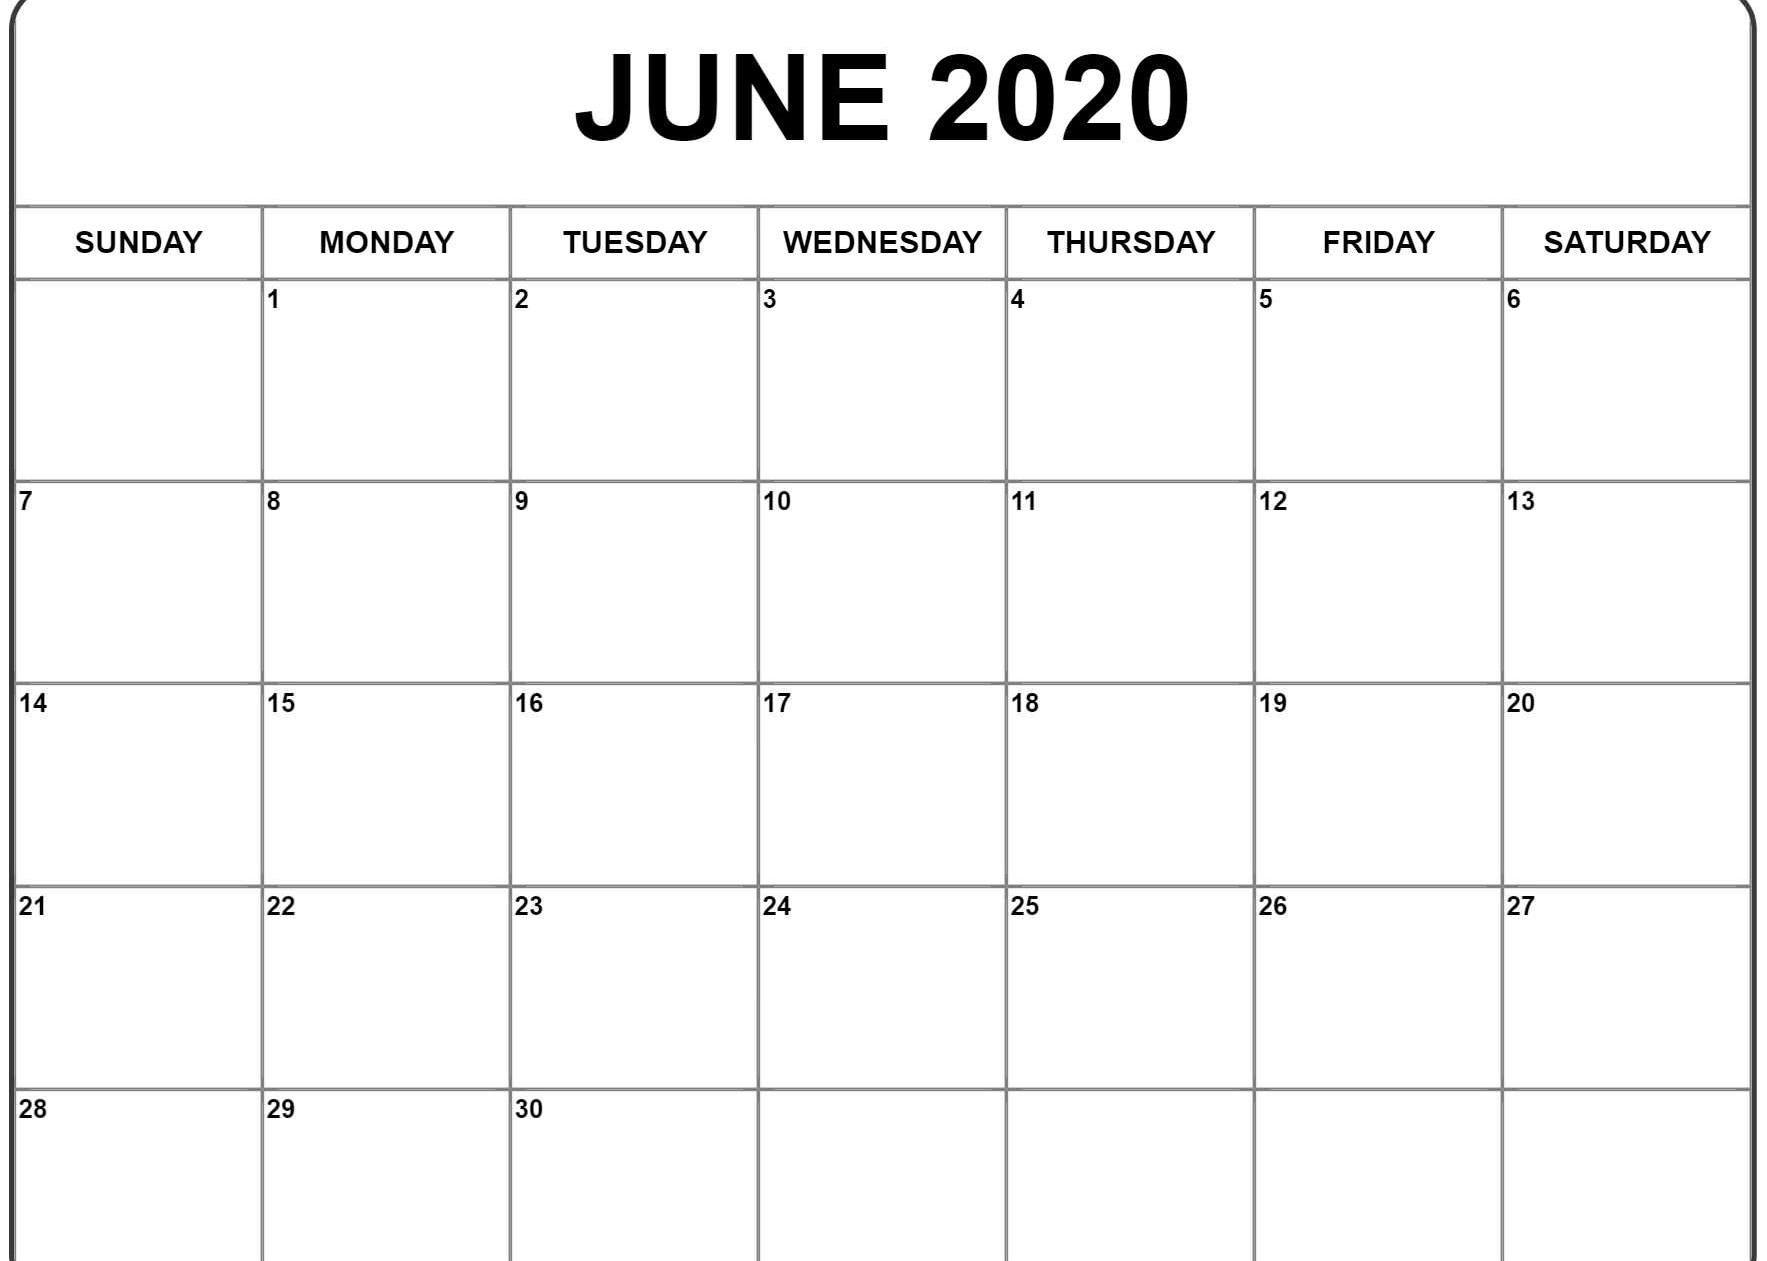 June 2020 Calendar | Printable Calendar Template, Monthly in 2020 Printable Calendar Sunday To Saturday